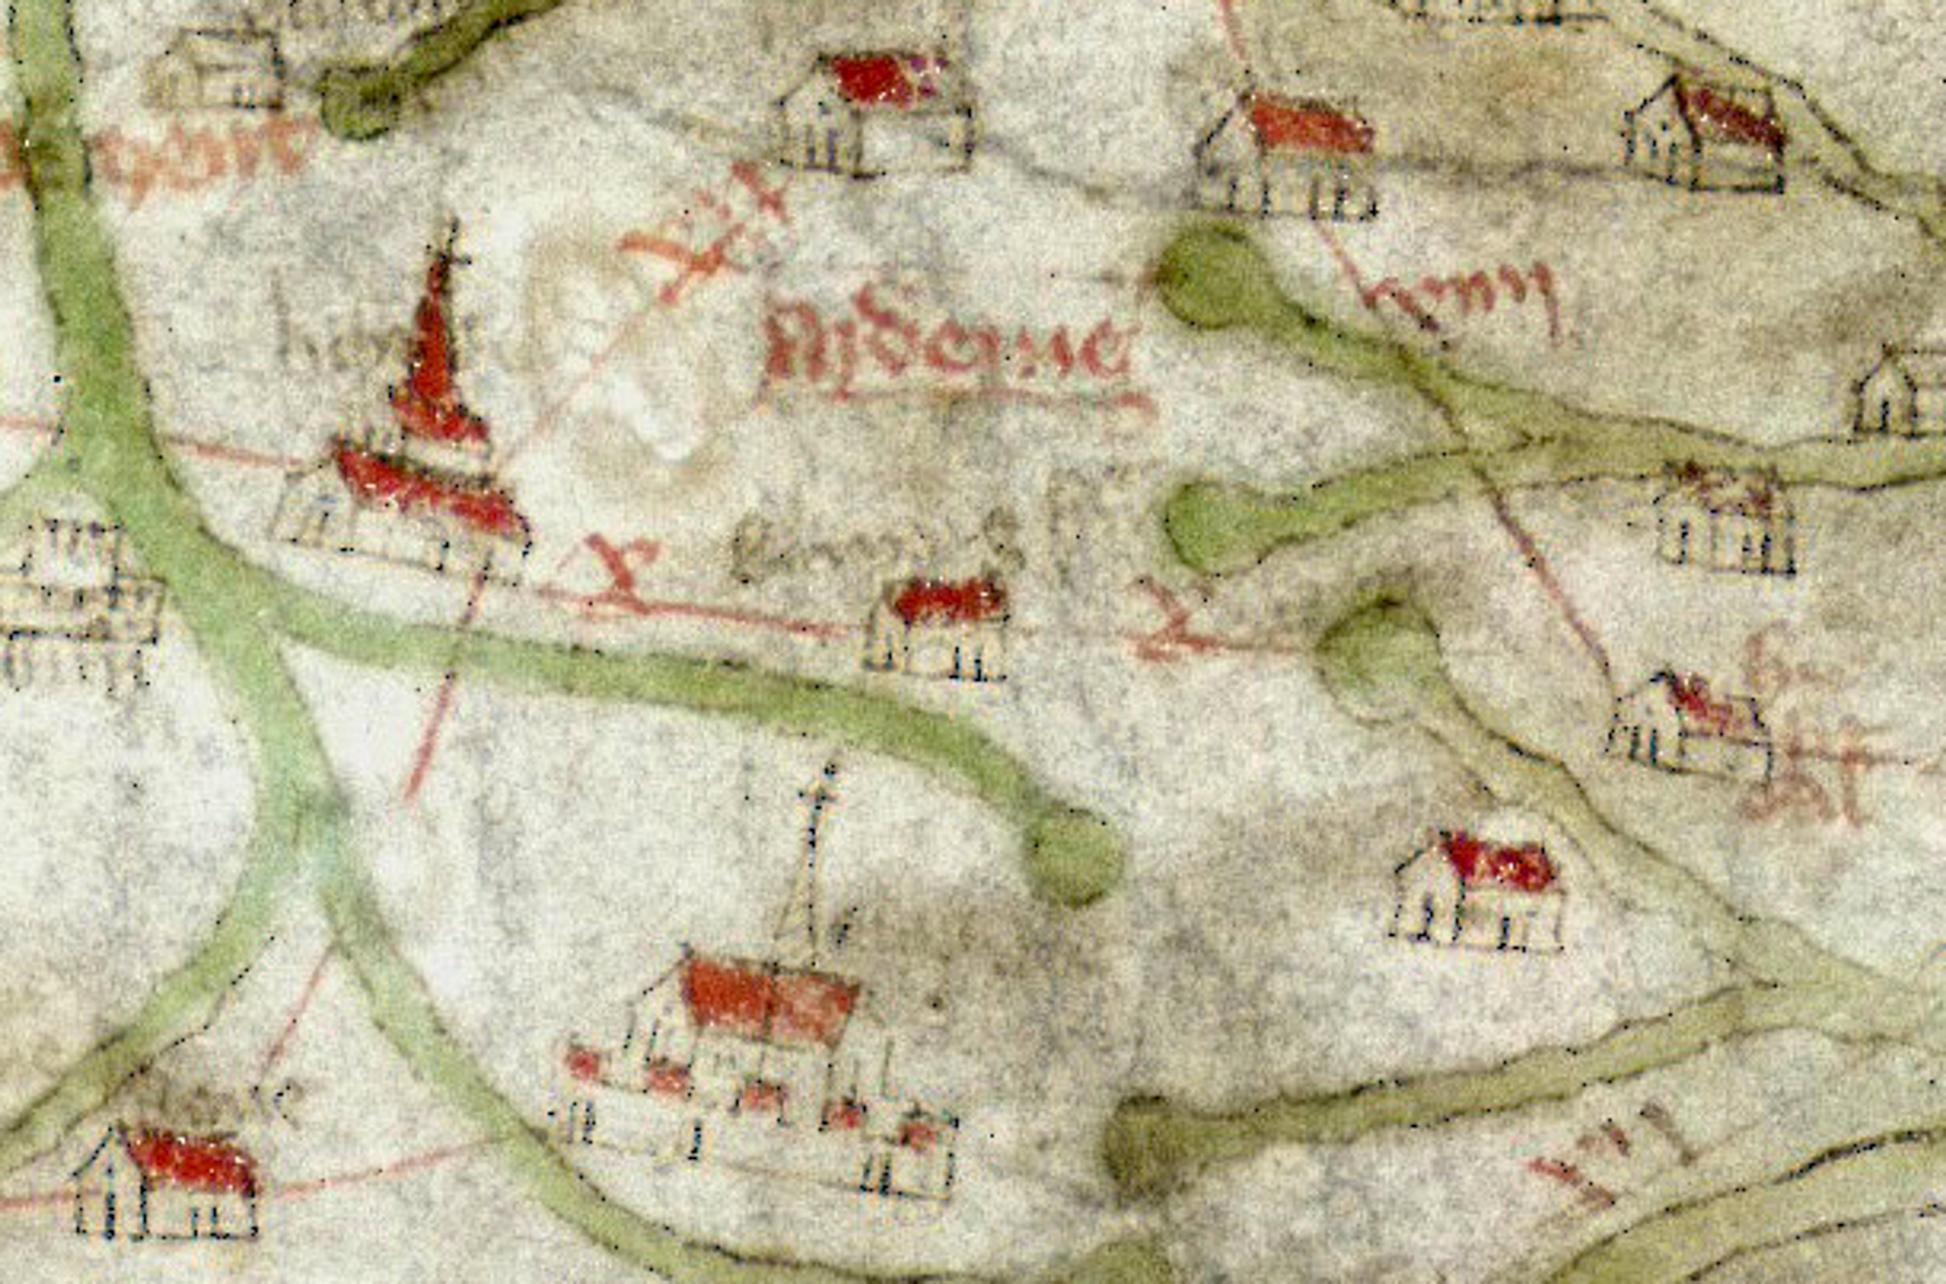 The 14th-century Gough Map